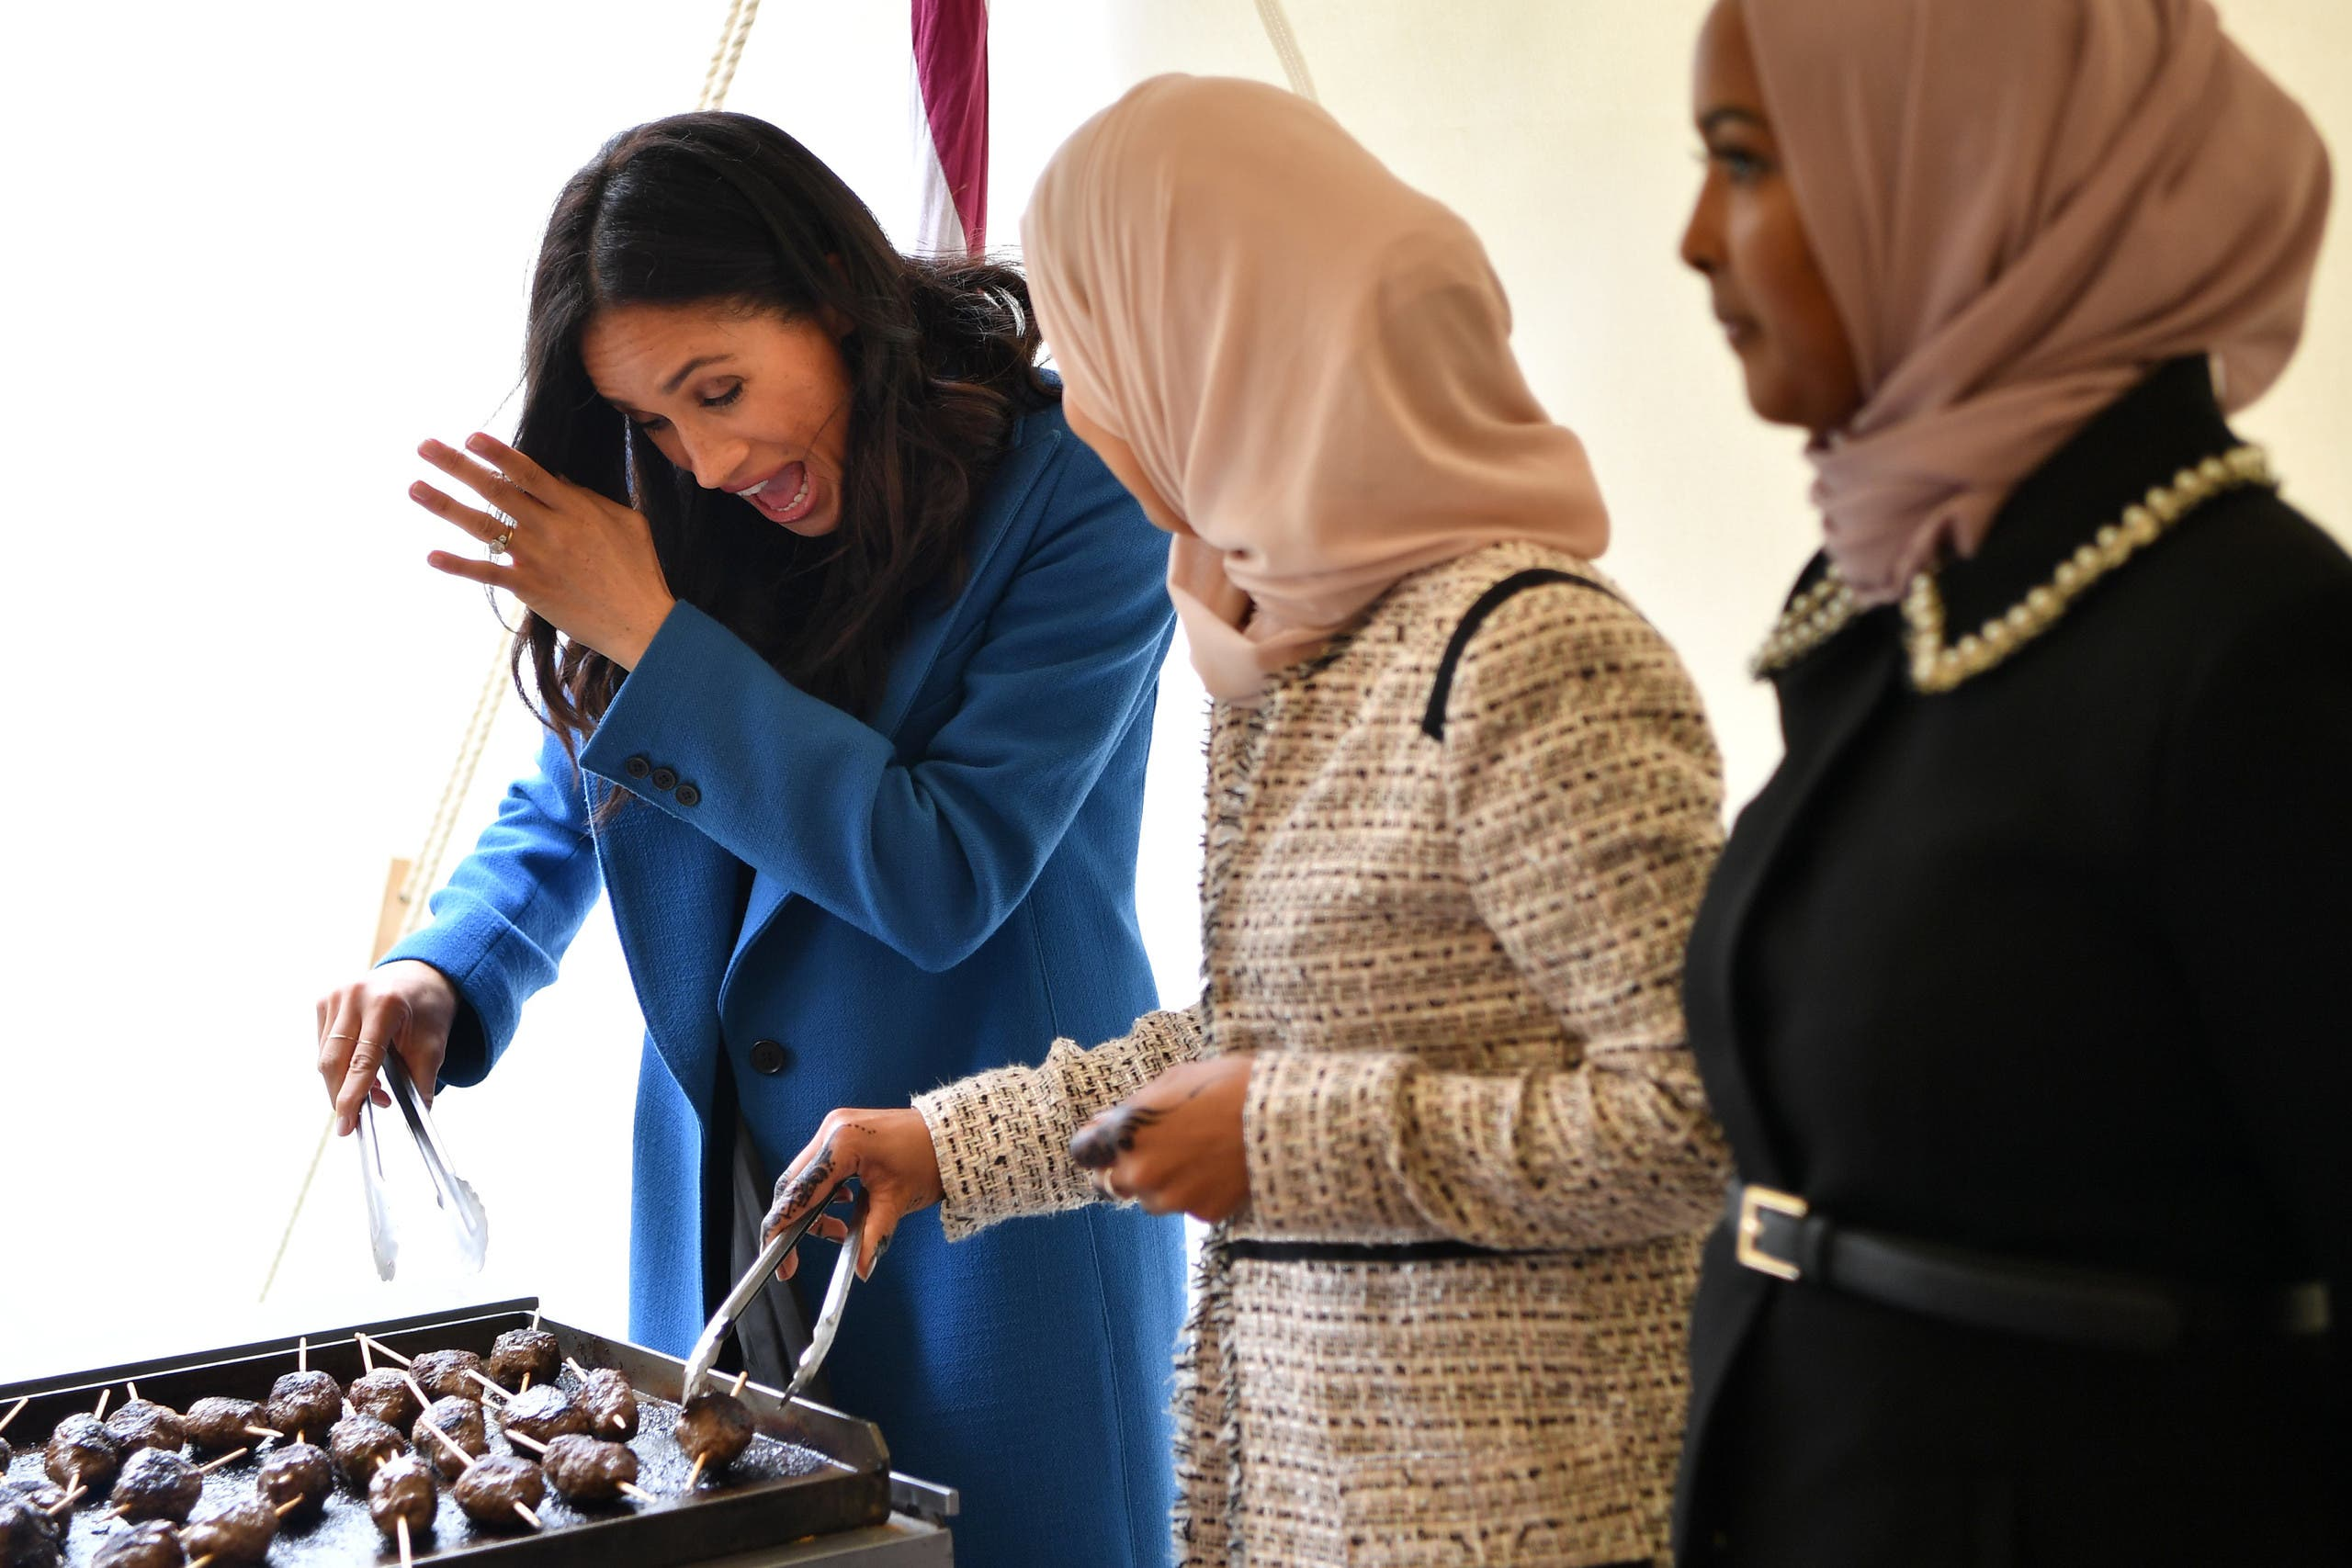 %name أم ميغان ميركل تشارك ابنتها العمل الخيري لصالح المسلمين  ونشر وصفات الطعام!!!